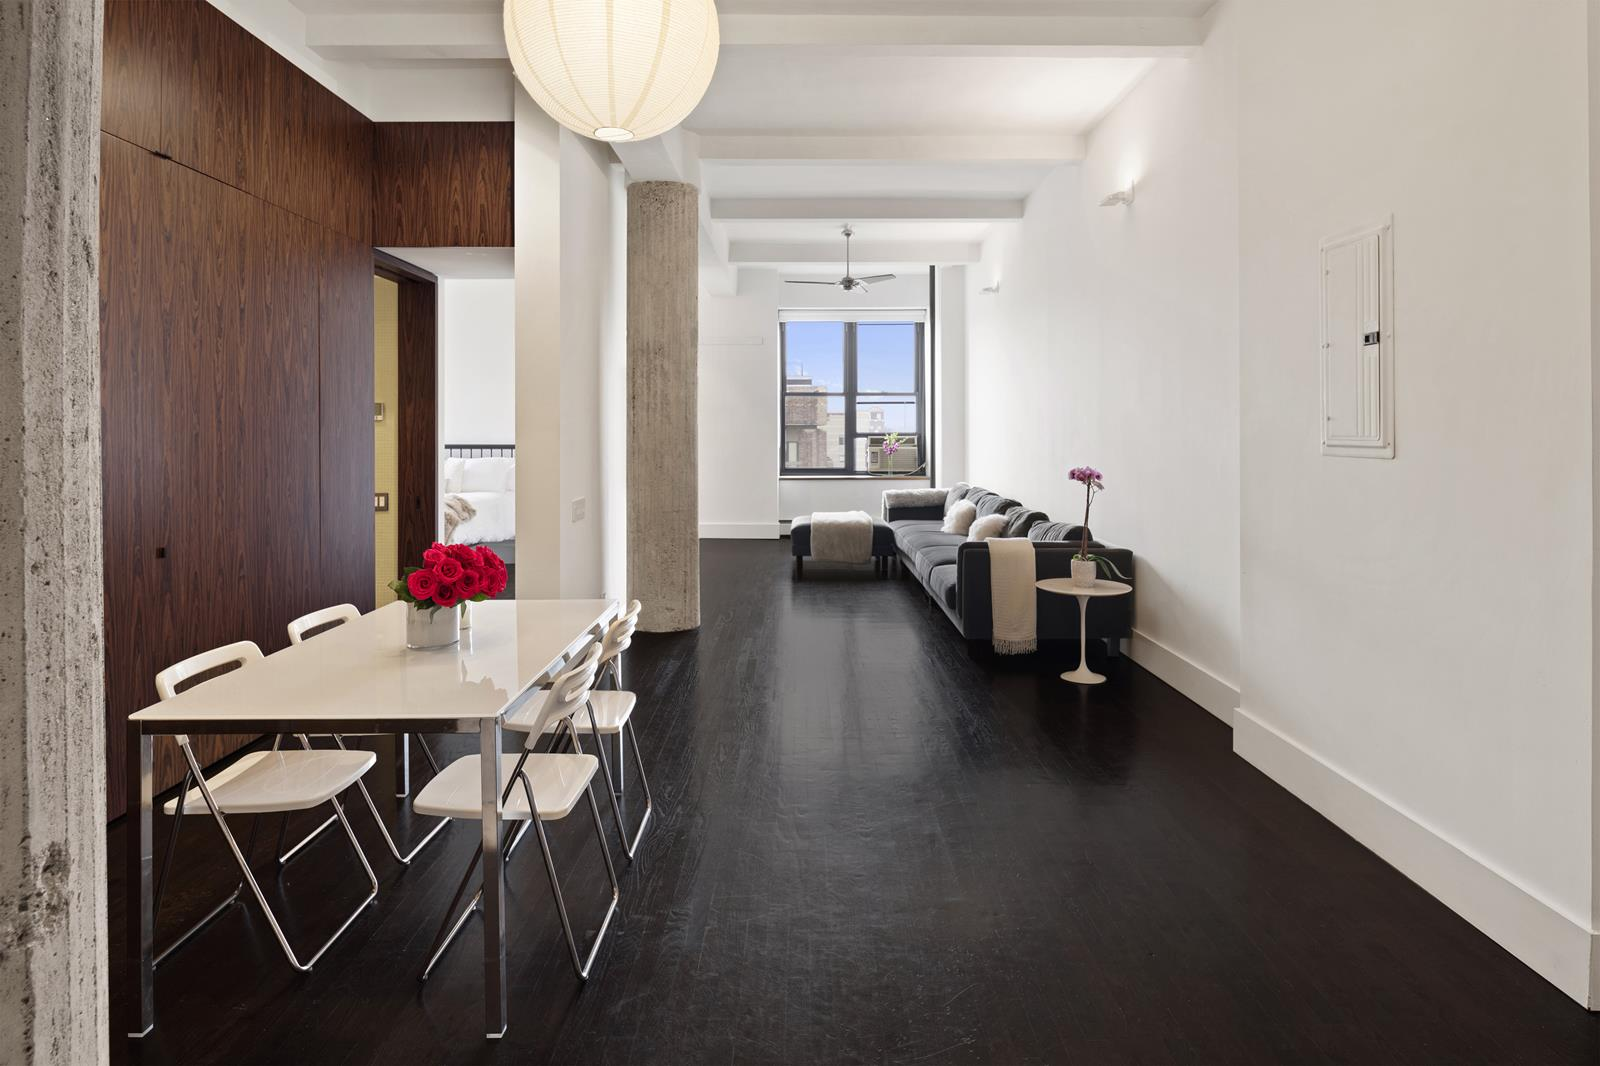 250 Mercer Street, Apt B1202-B12S, Manhattan, New York 10012